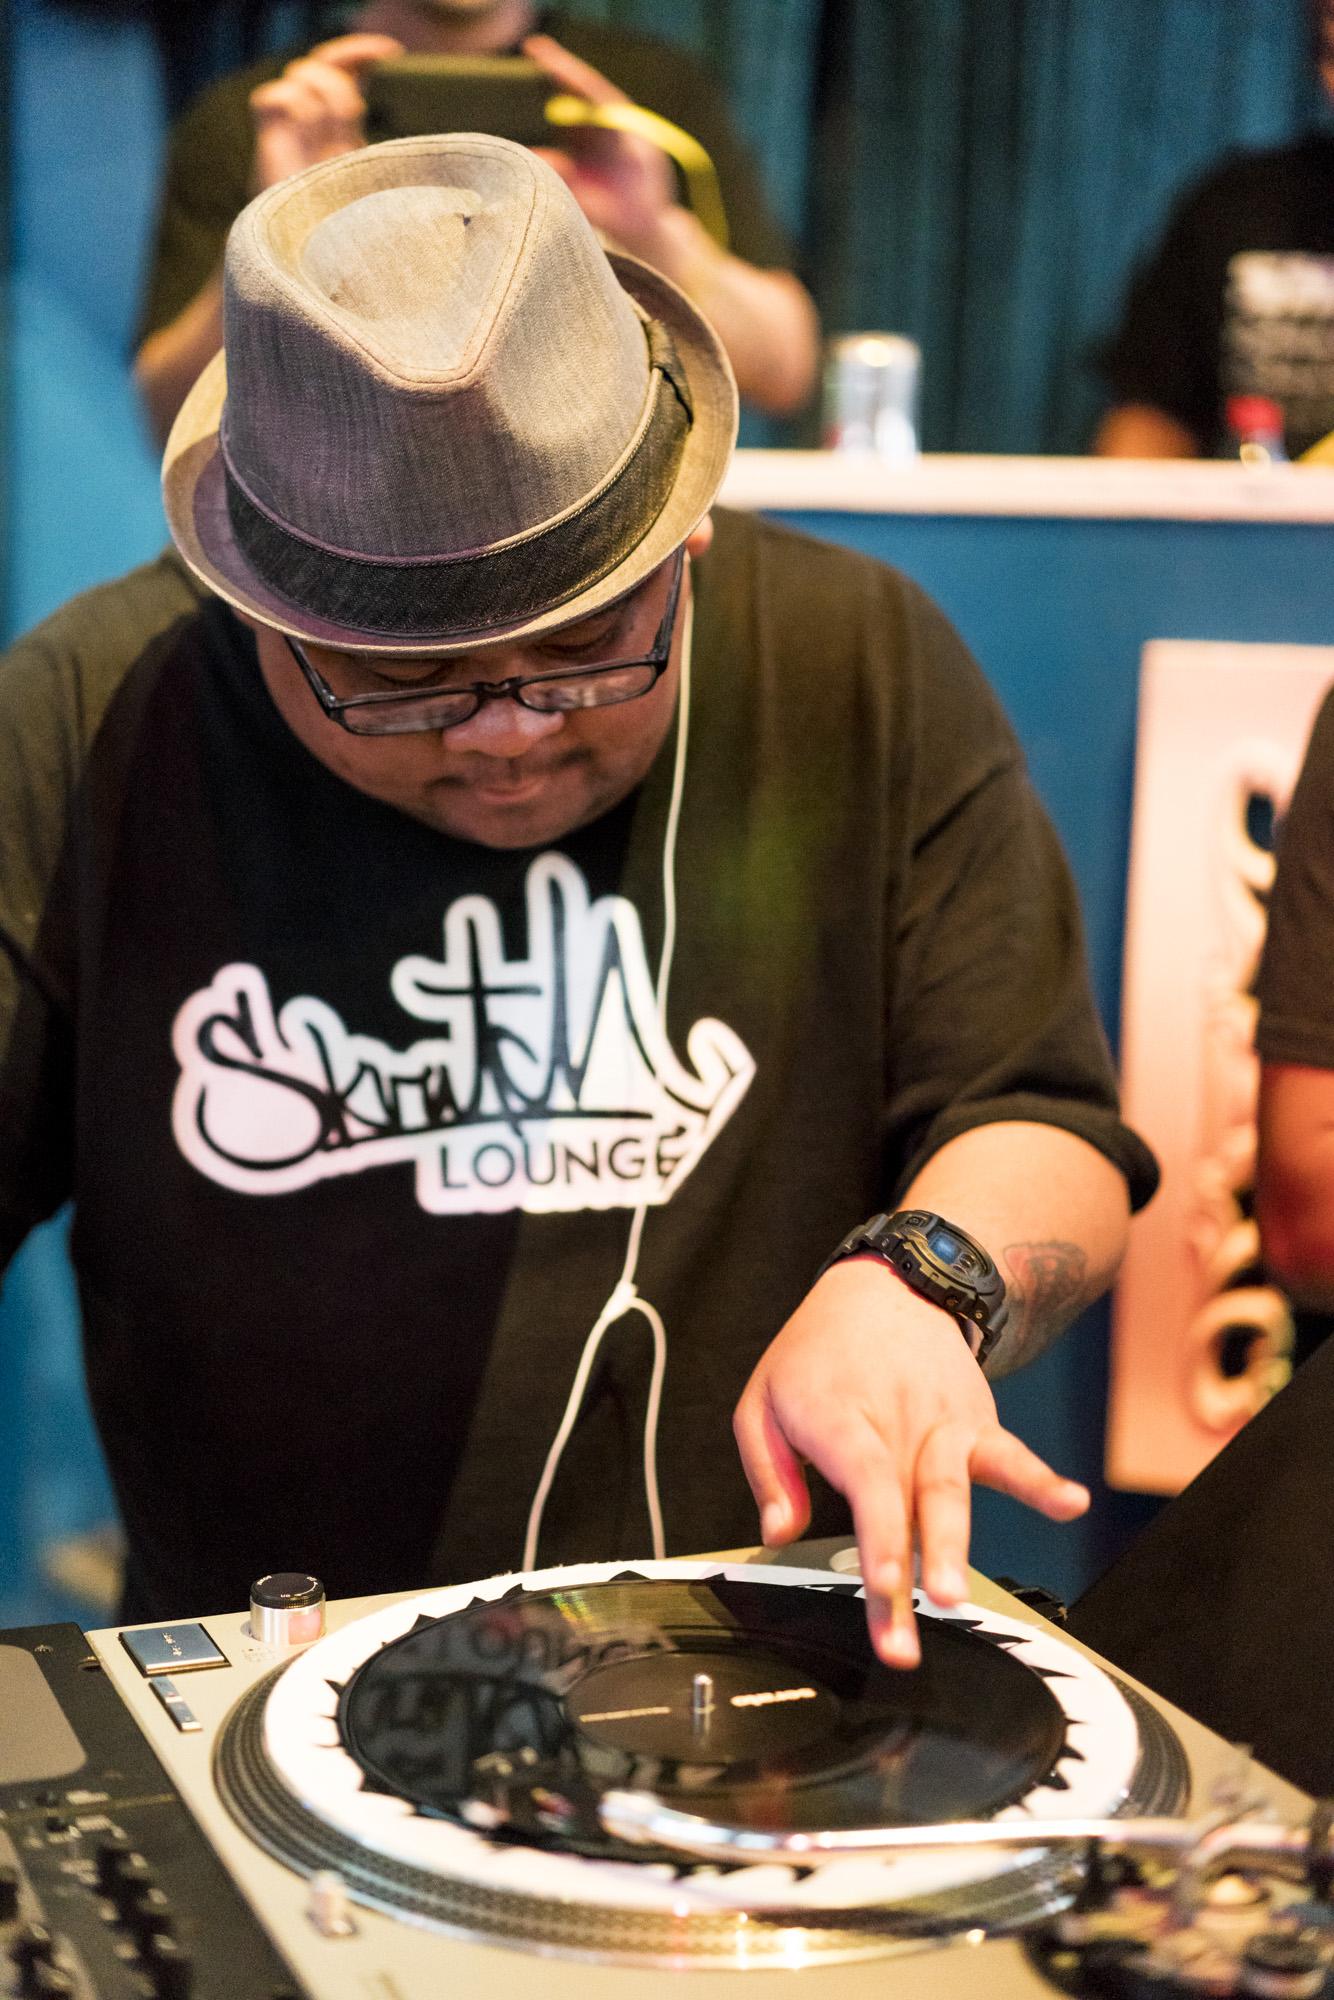 2016_04_07_Skratch Lounge 6 Yr_0104_Export.jpg